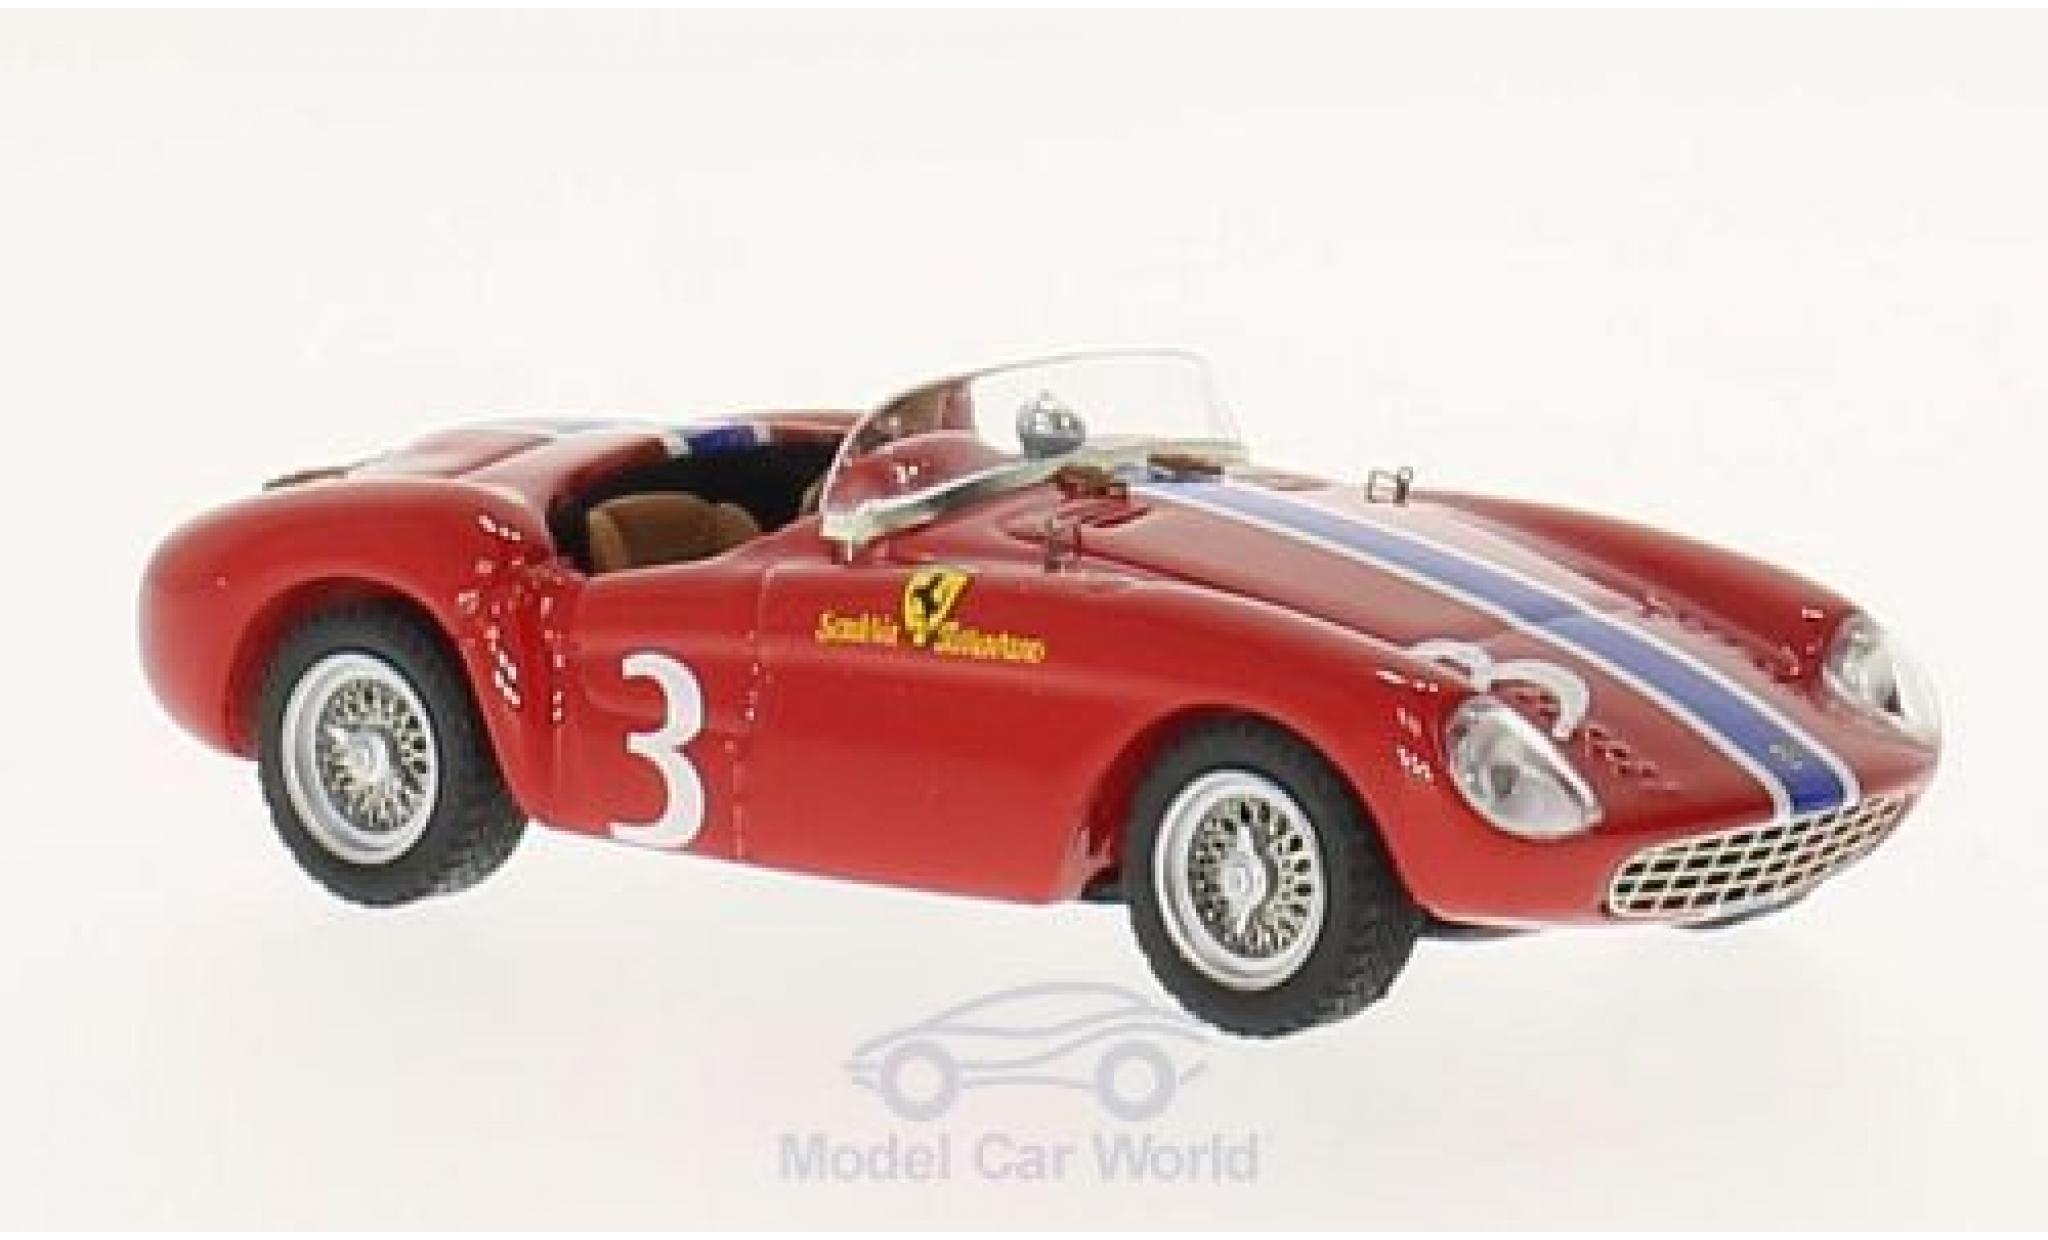 Ferrari 500 Mondial 1/43 Art Model Mondial RHD No.3 Scuderia Parravano Palm Springs 1955 B.Kessier